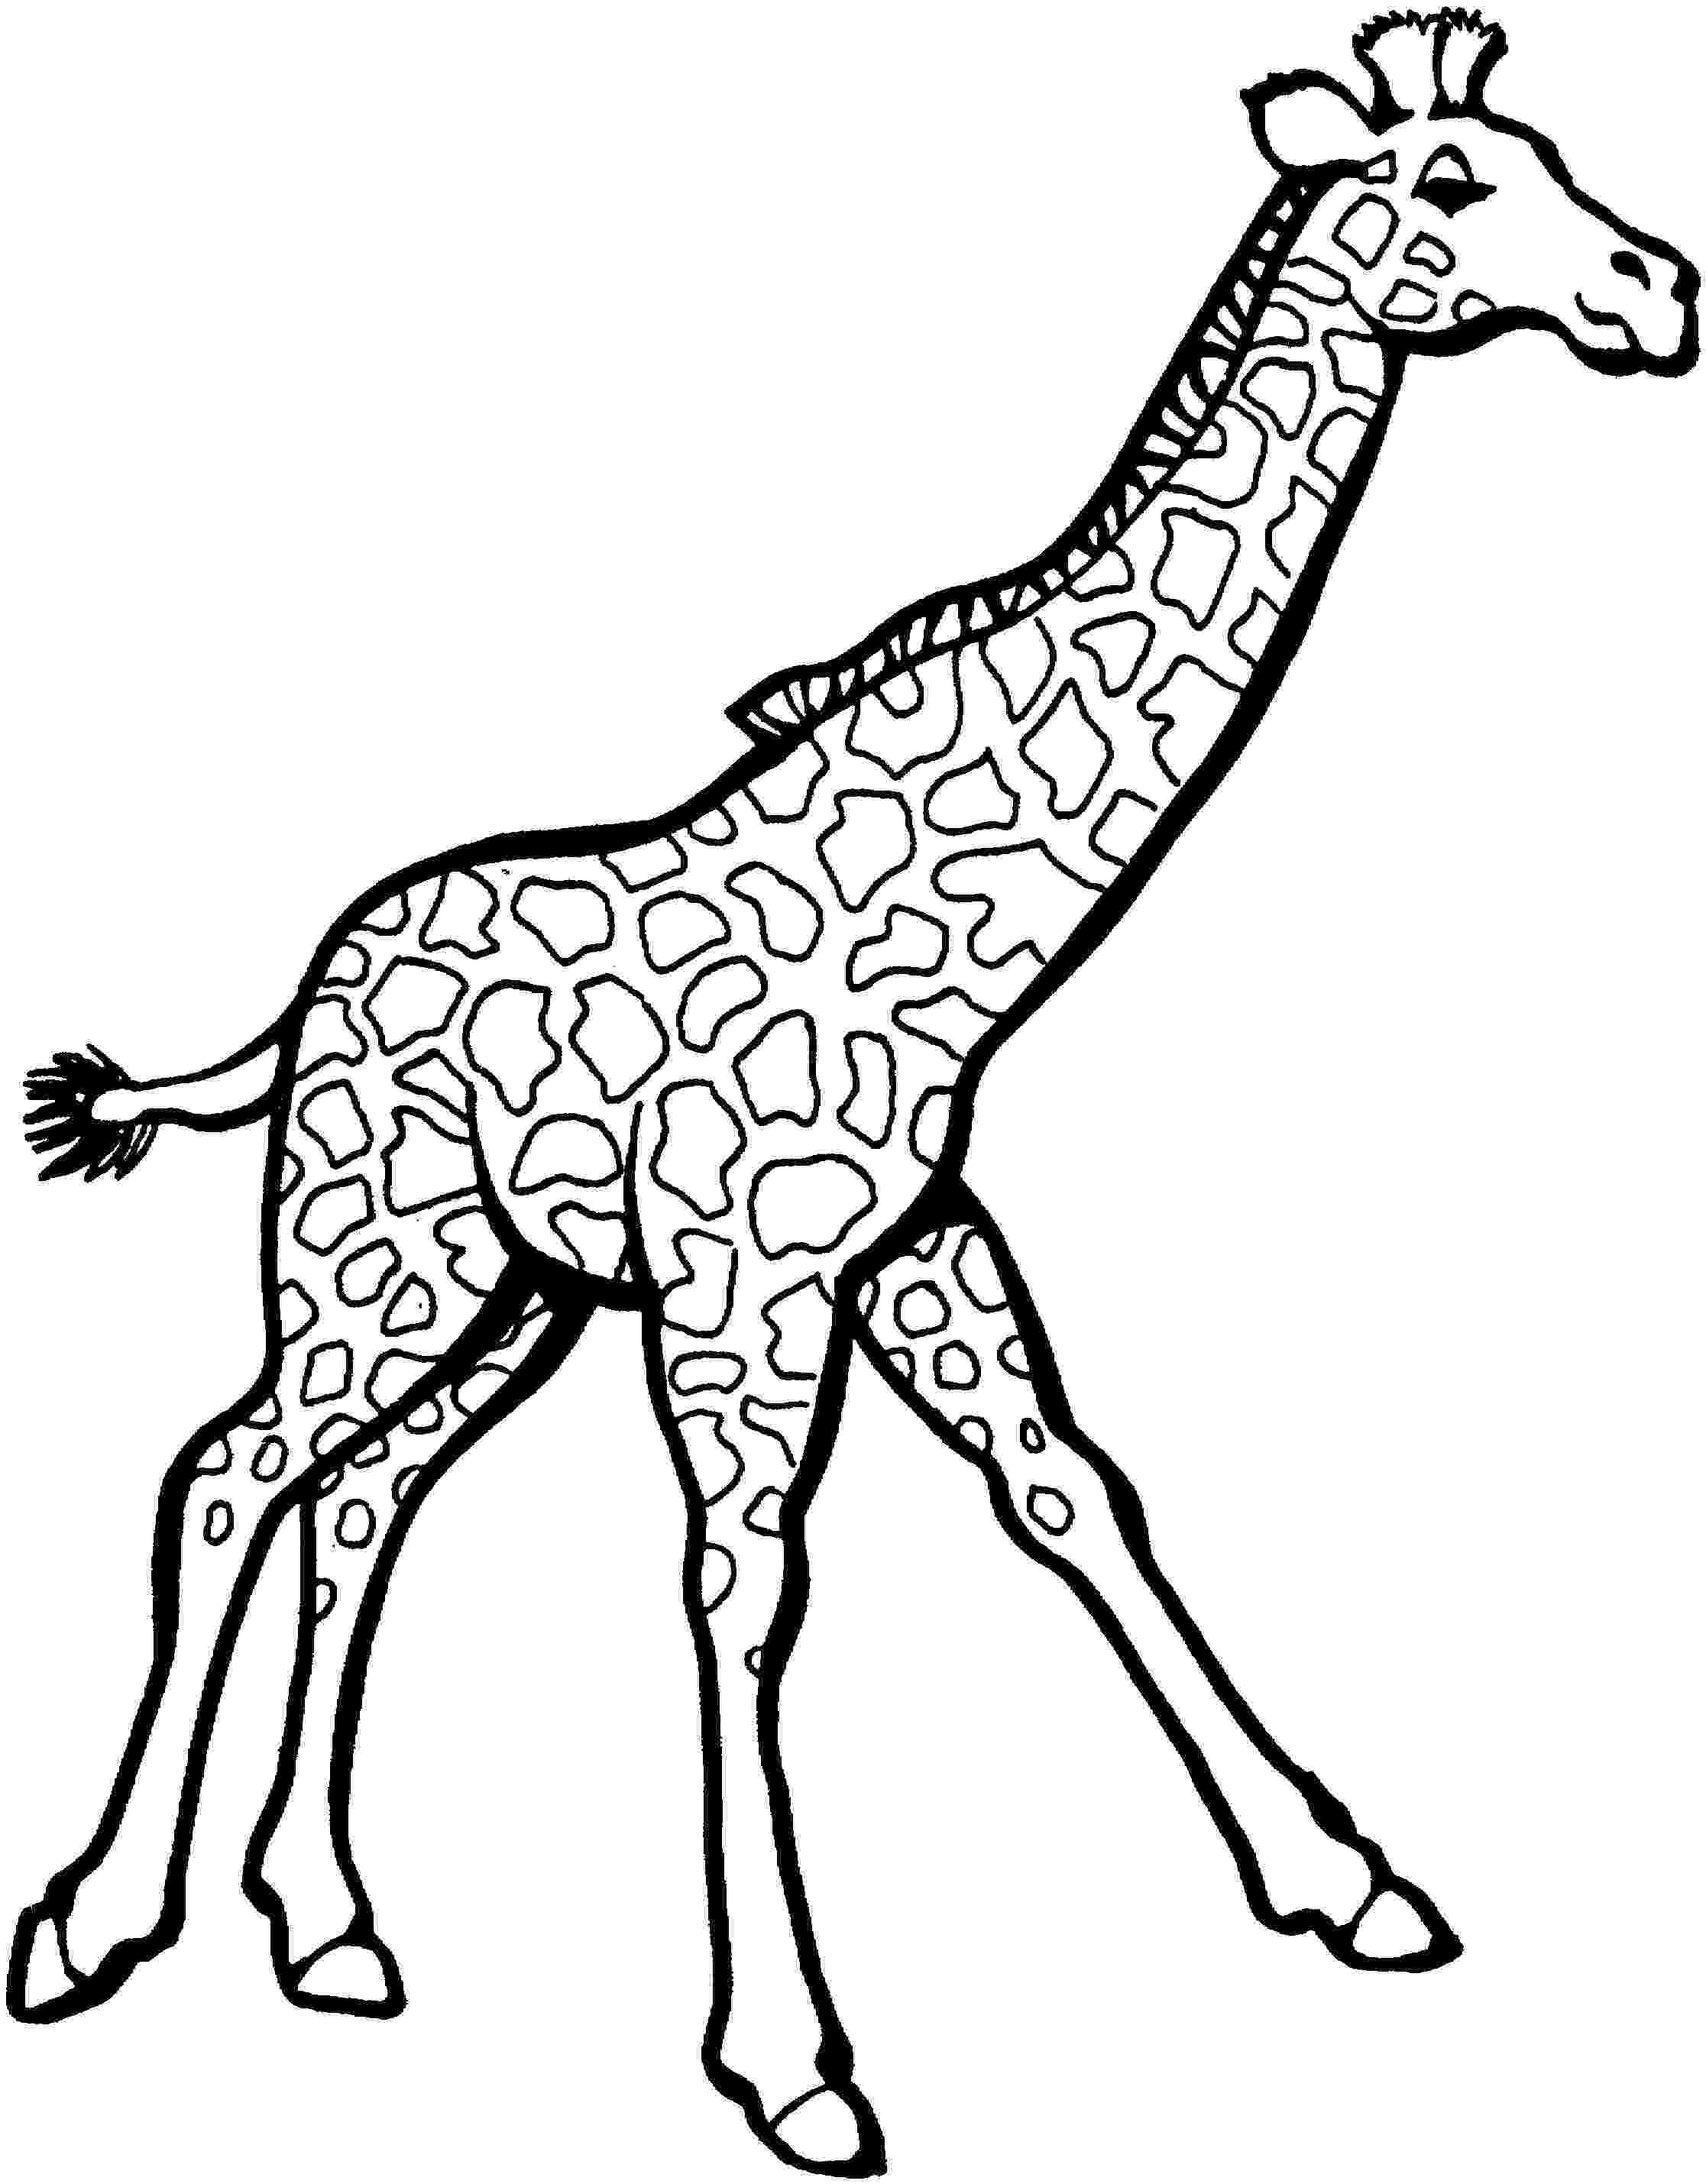 giraffe coloring pages giraffe coloring pages bestappsforkidscom pages giraffe coloring